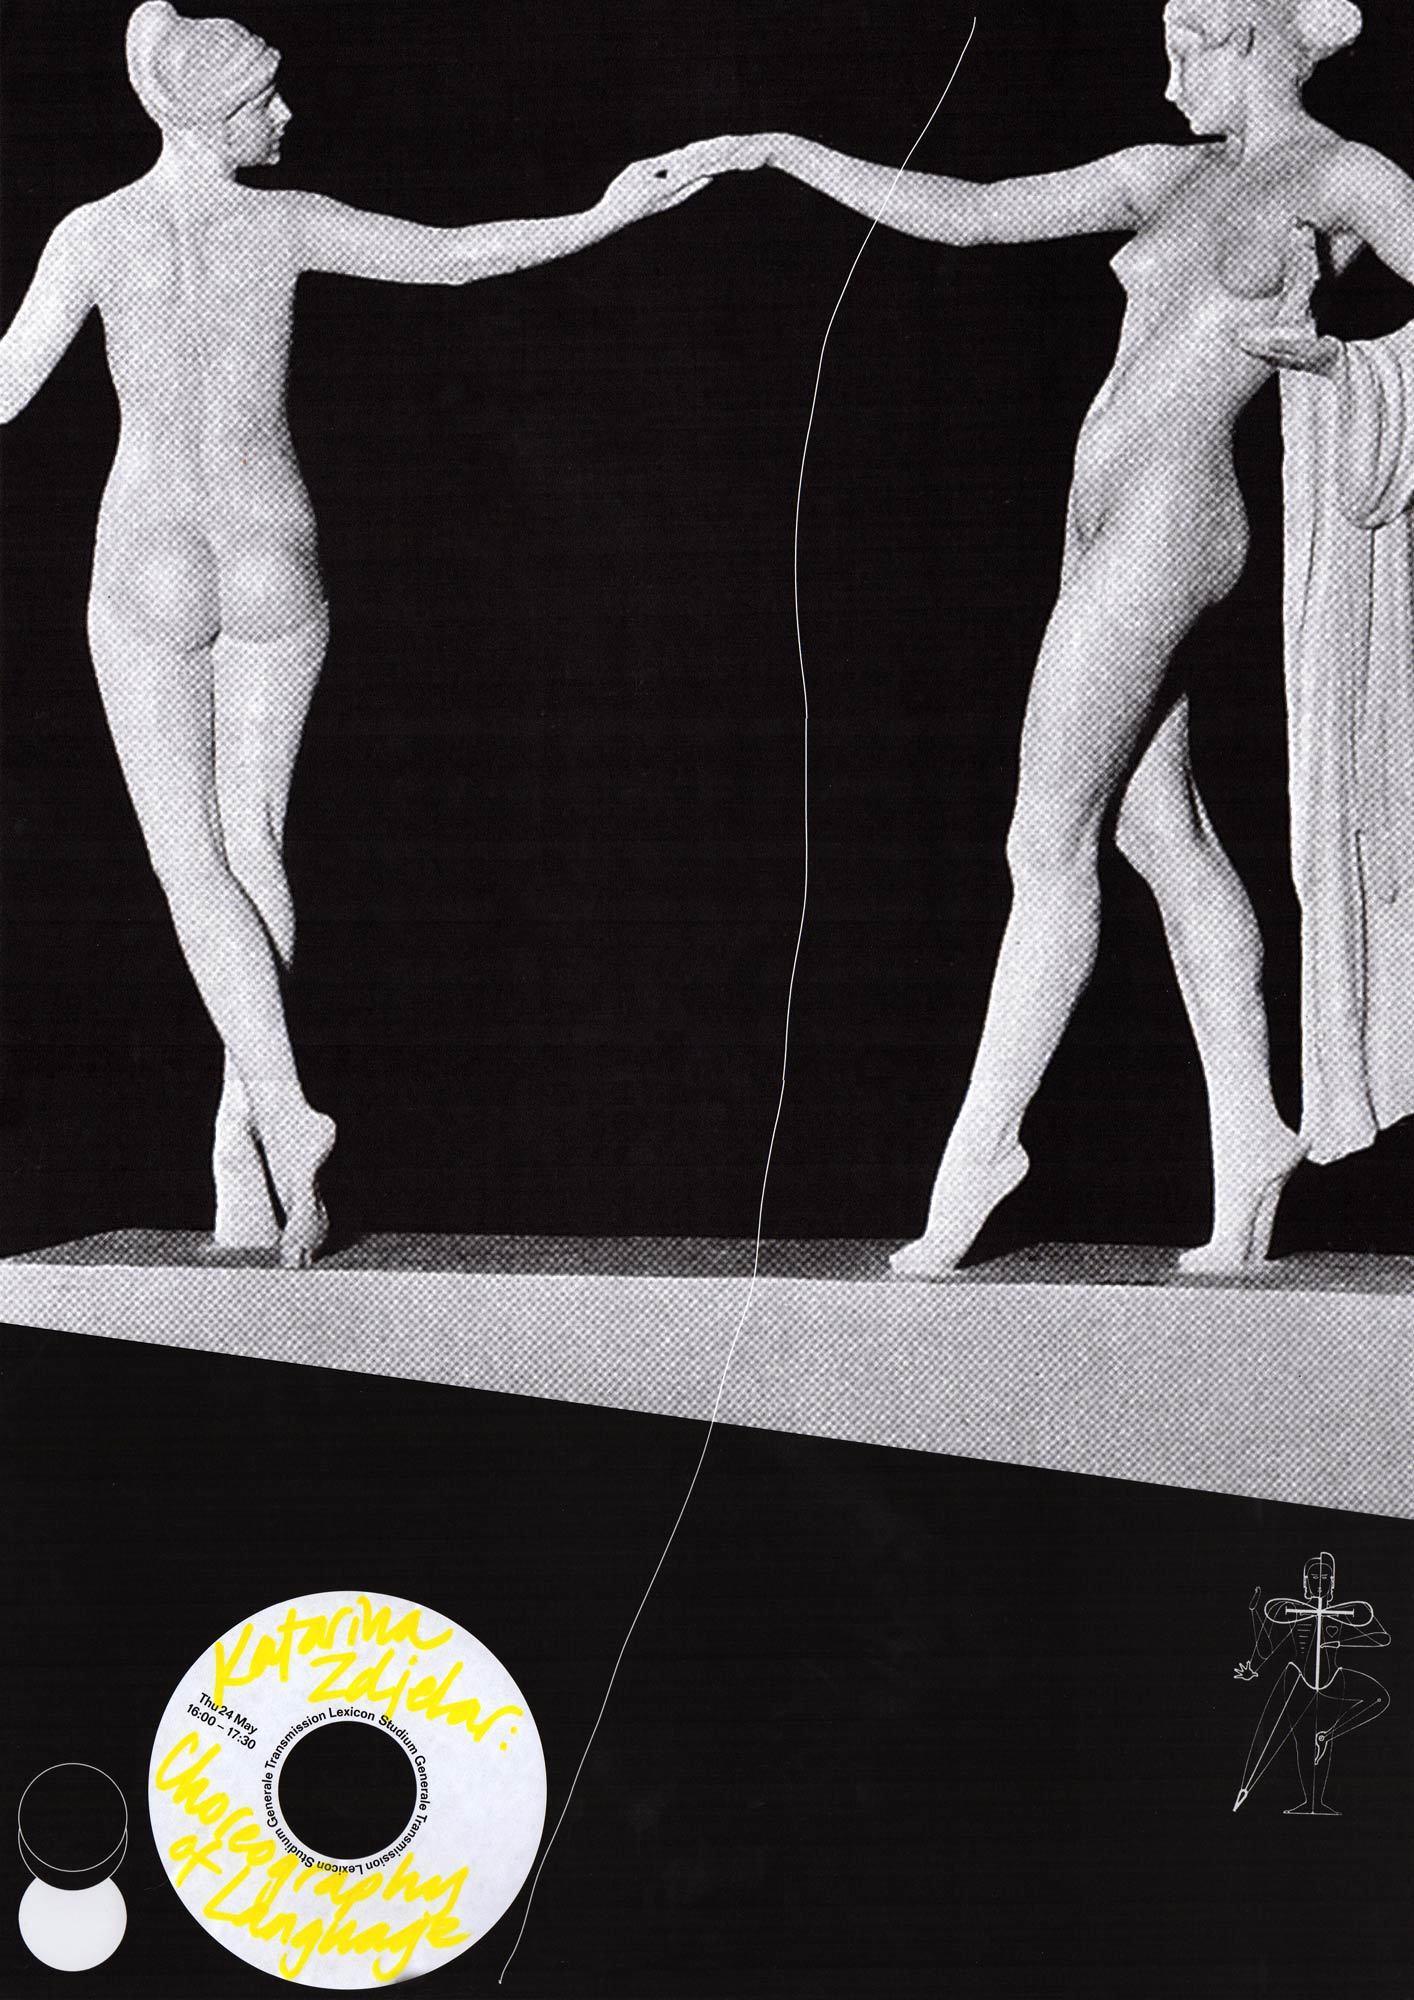 KABK Studium Generale Lecture: 'Choreography of Language' by Katarina Zdjelar